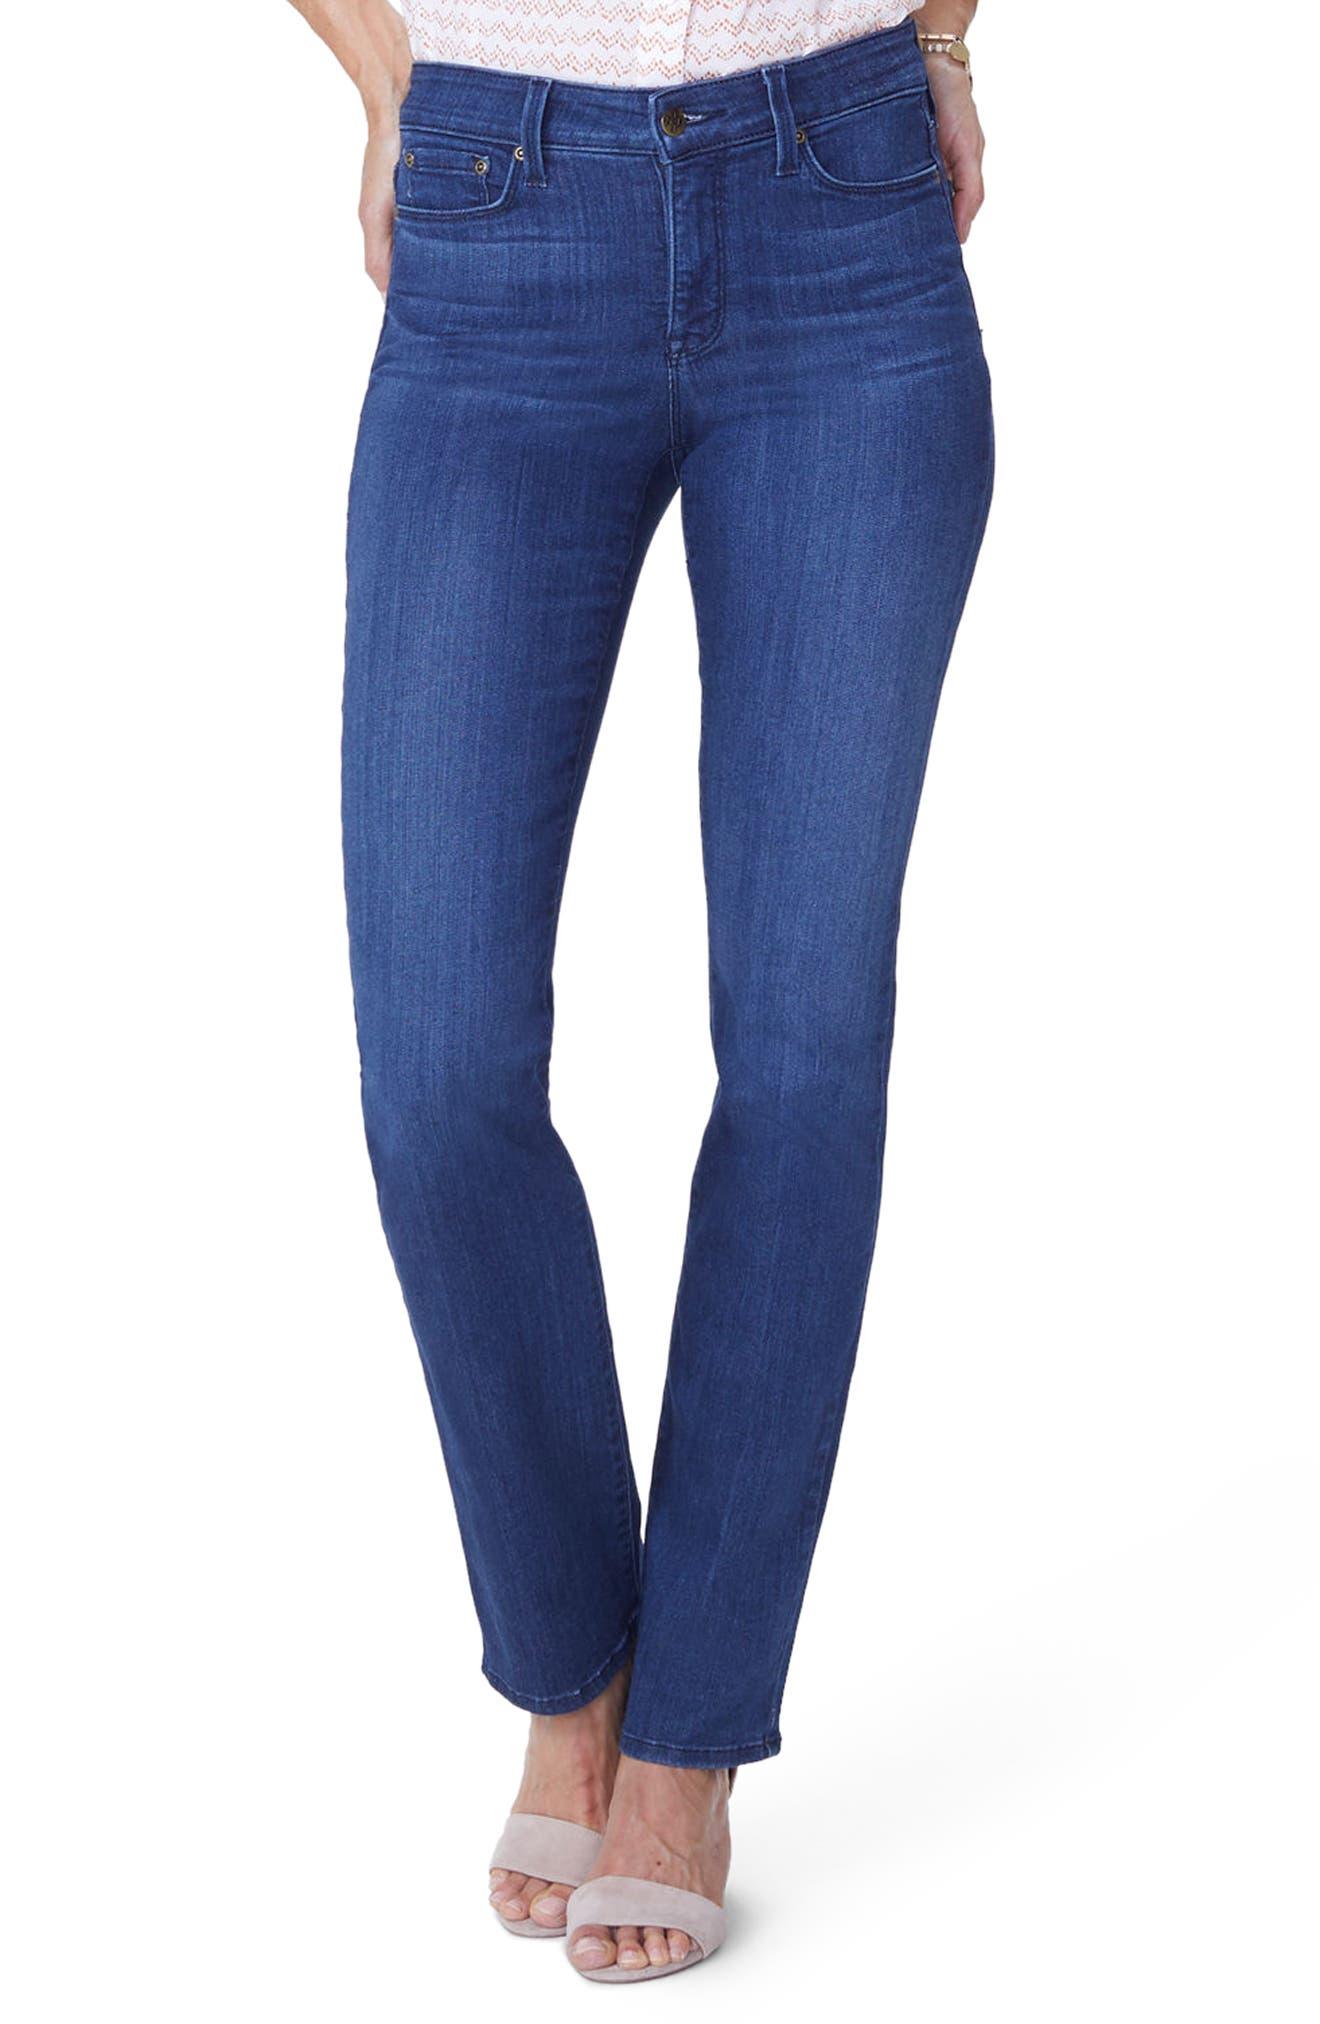 Marilyn Straight Jeans,                             Main thumbnail 1, color,                             Lark